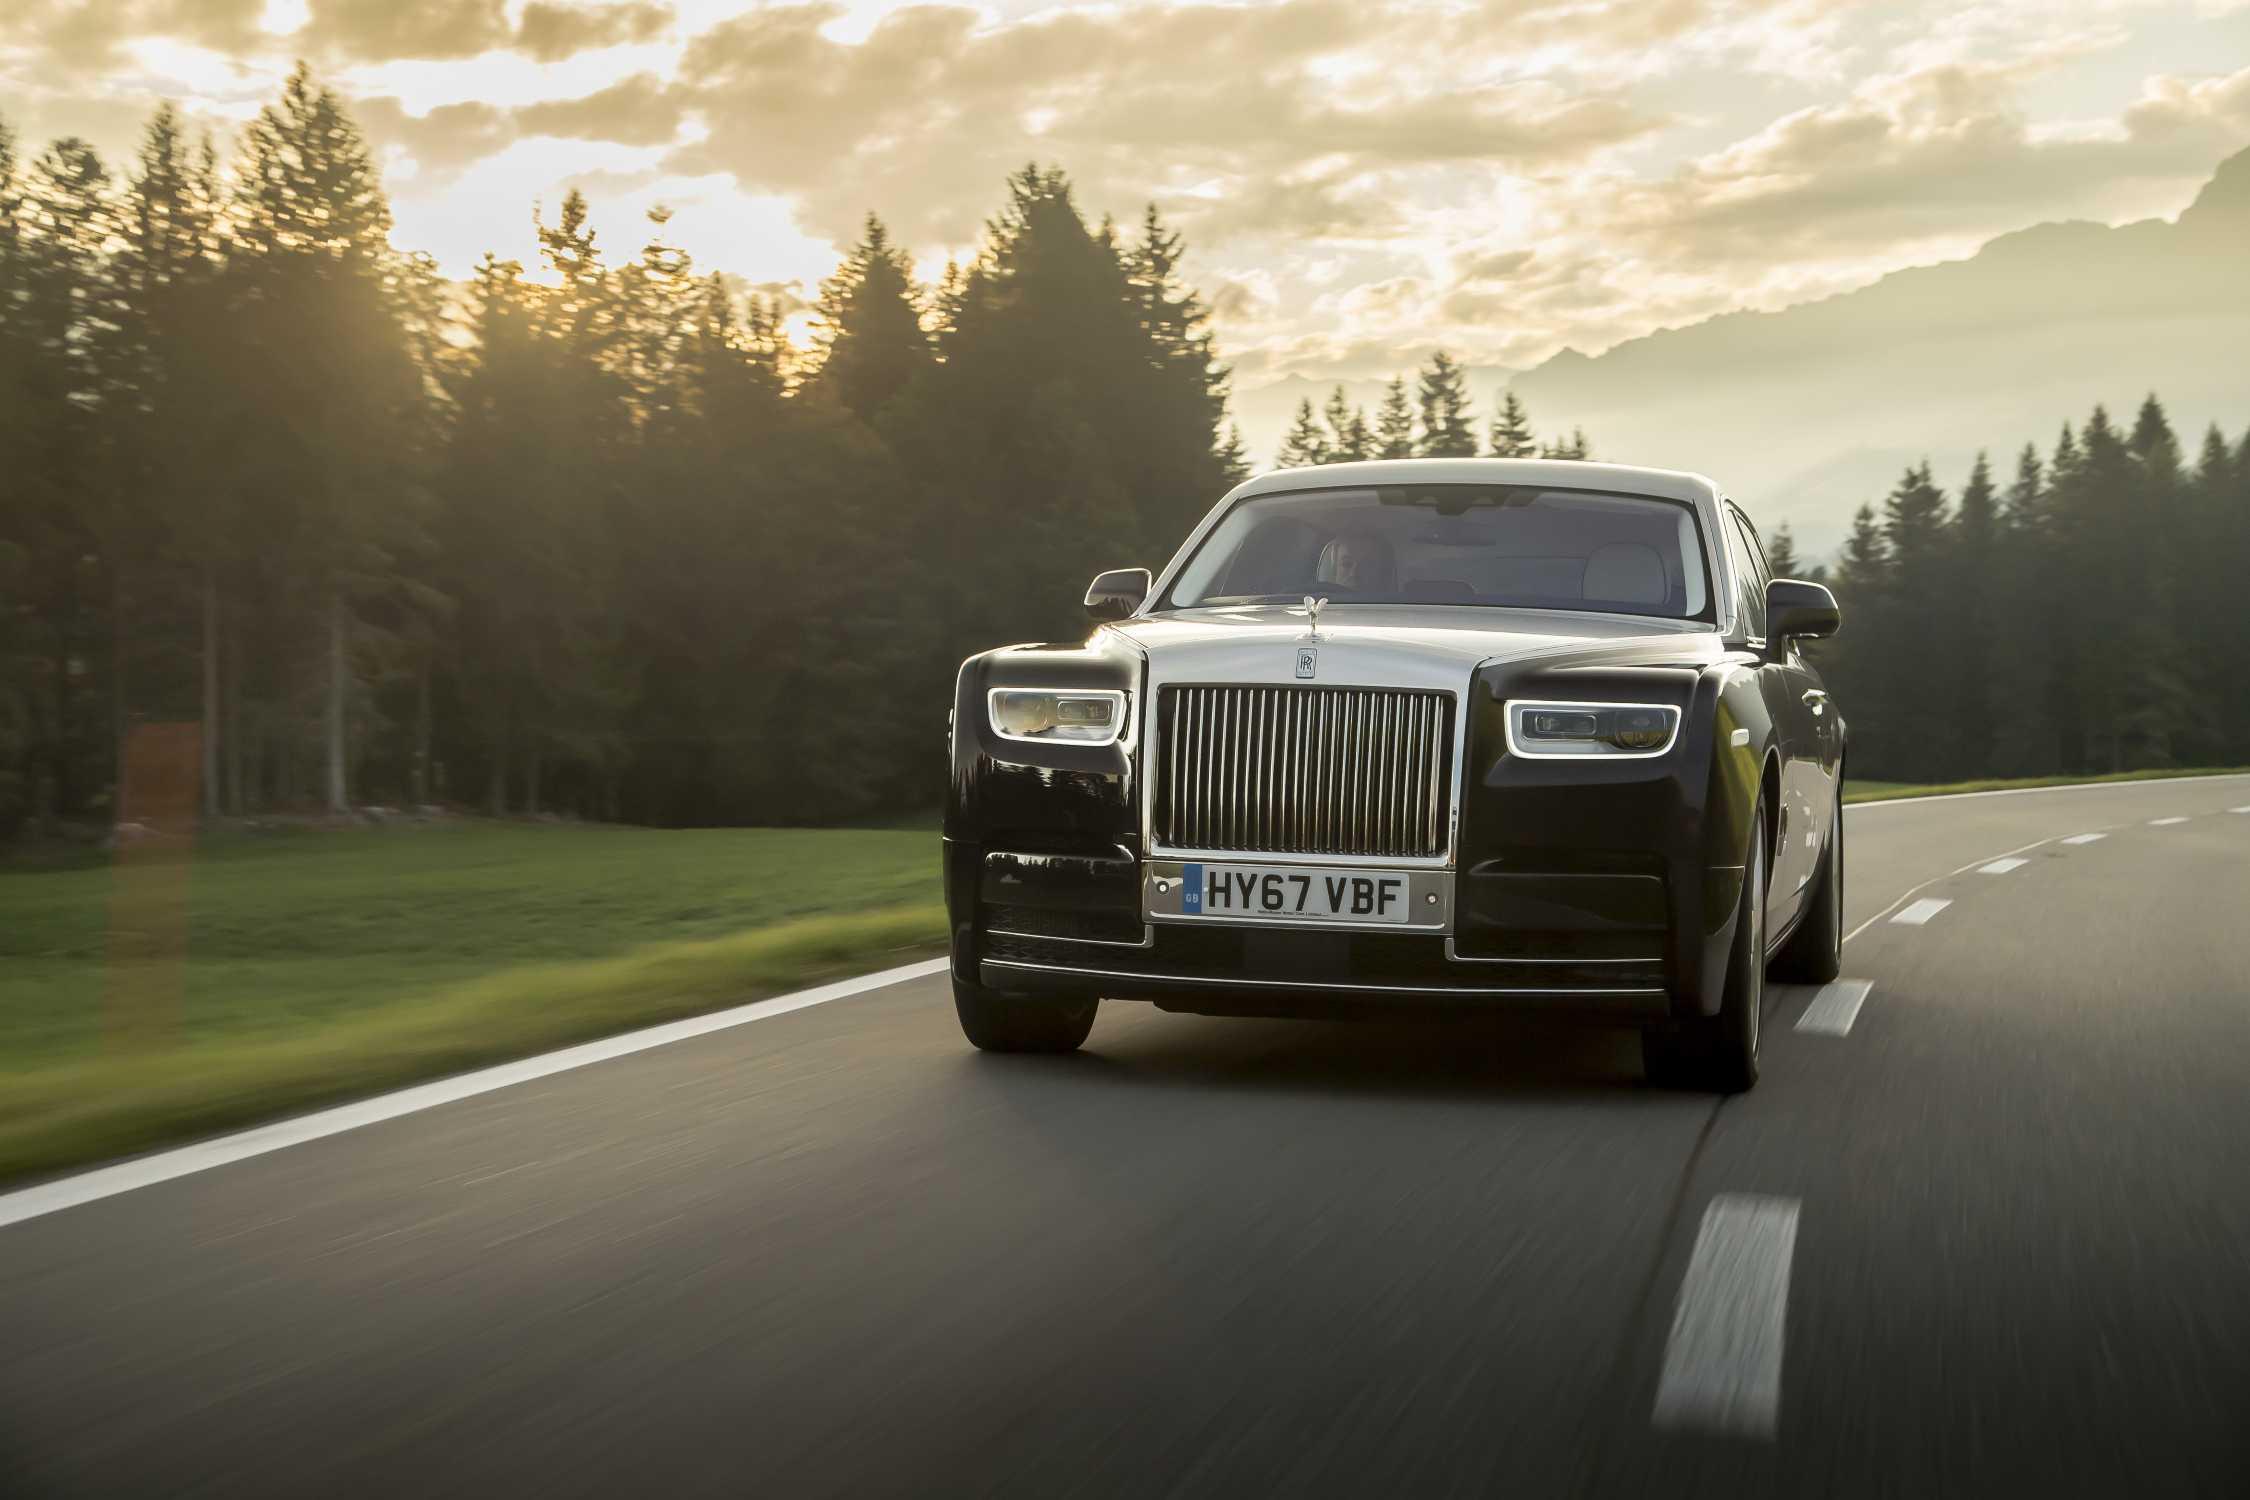 NEW ROLLS ROYCE PHANTOM NAMED BEST LUXURY CAR IN UK CAR OF THE